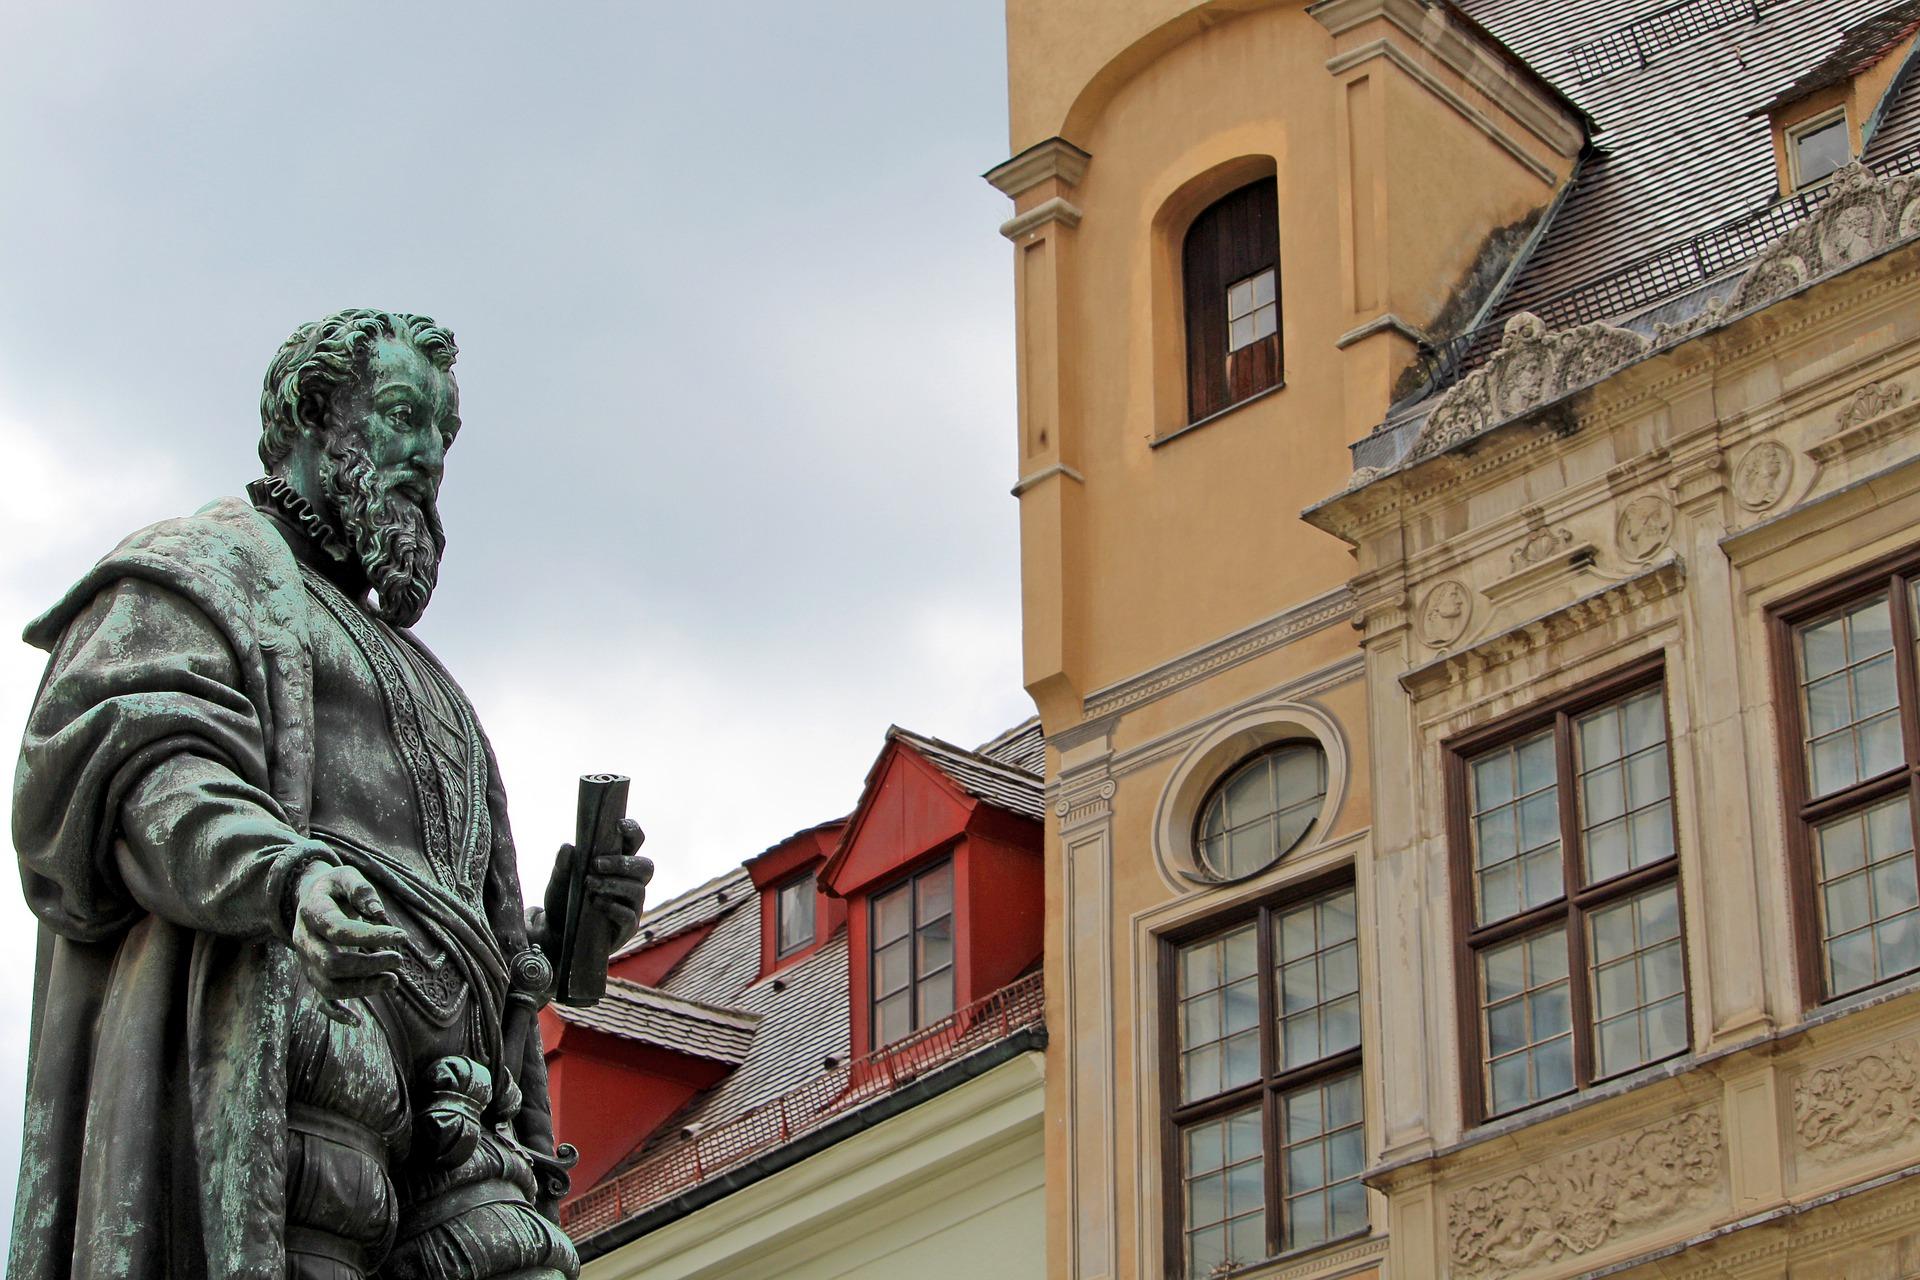 Statue In Der Fuggerei In Augsburg